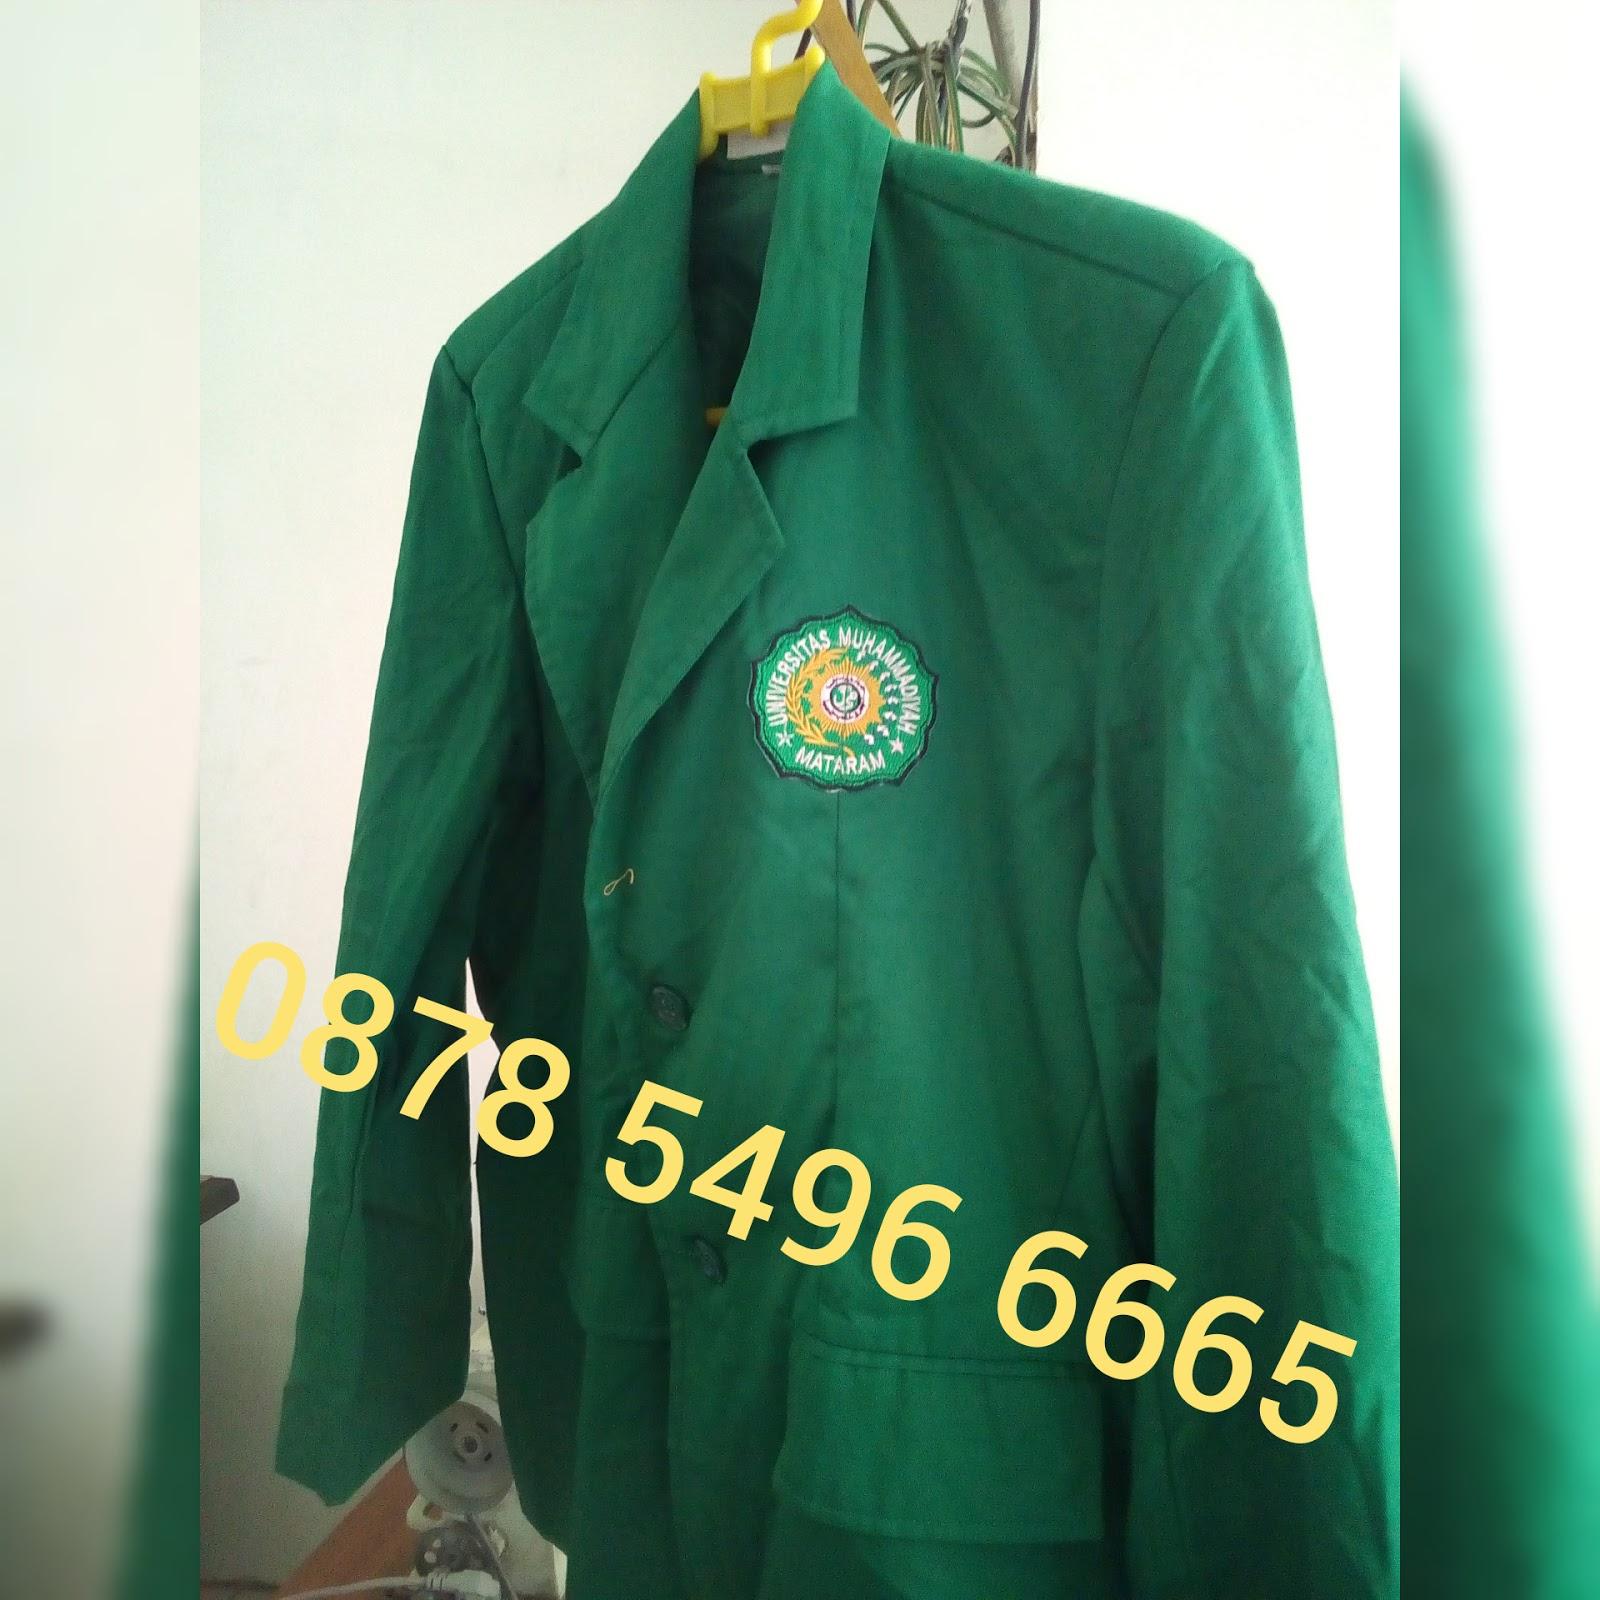 Kami toko on line menerima pesanan Jas Almamater Perguruan tinggi negeri 208607fd6e